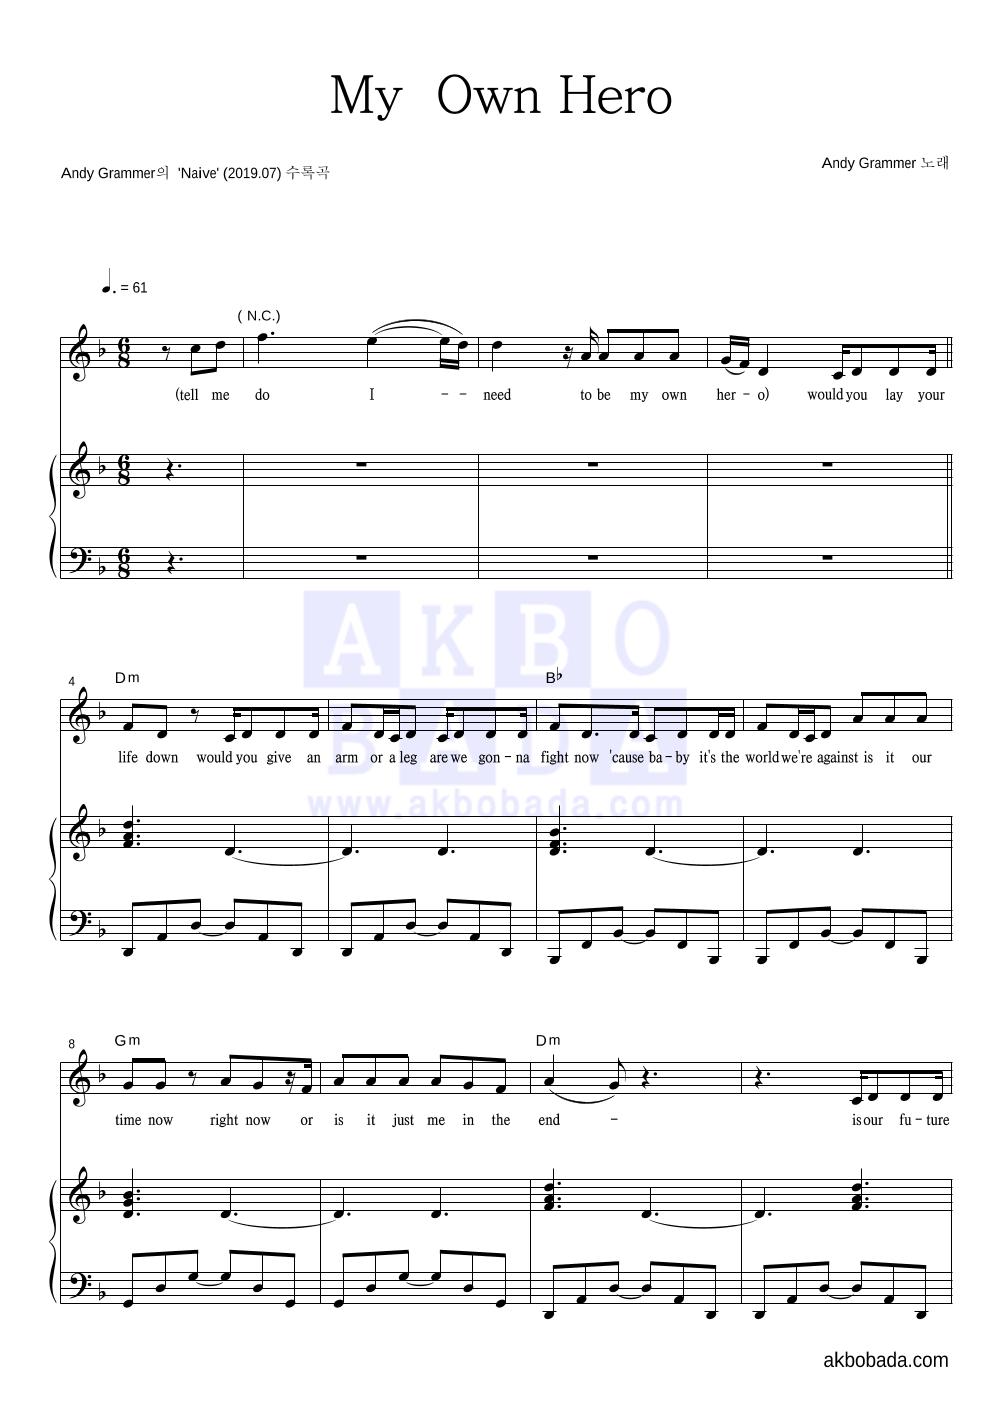 Andy Grammer - My  Own Hero 피아노 3단 악보